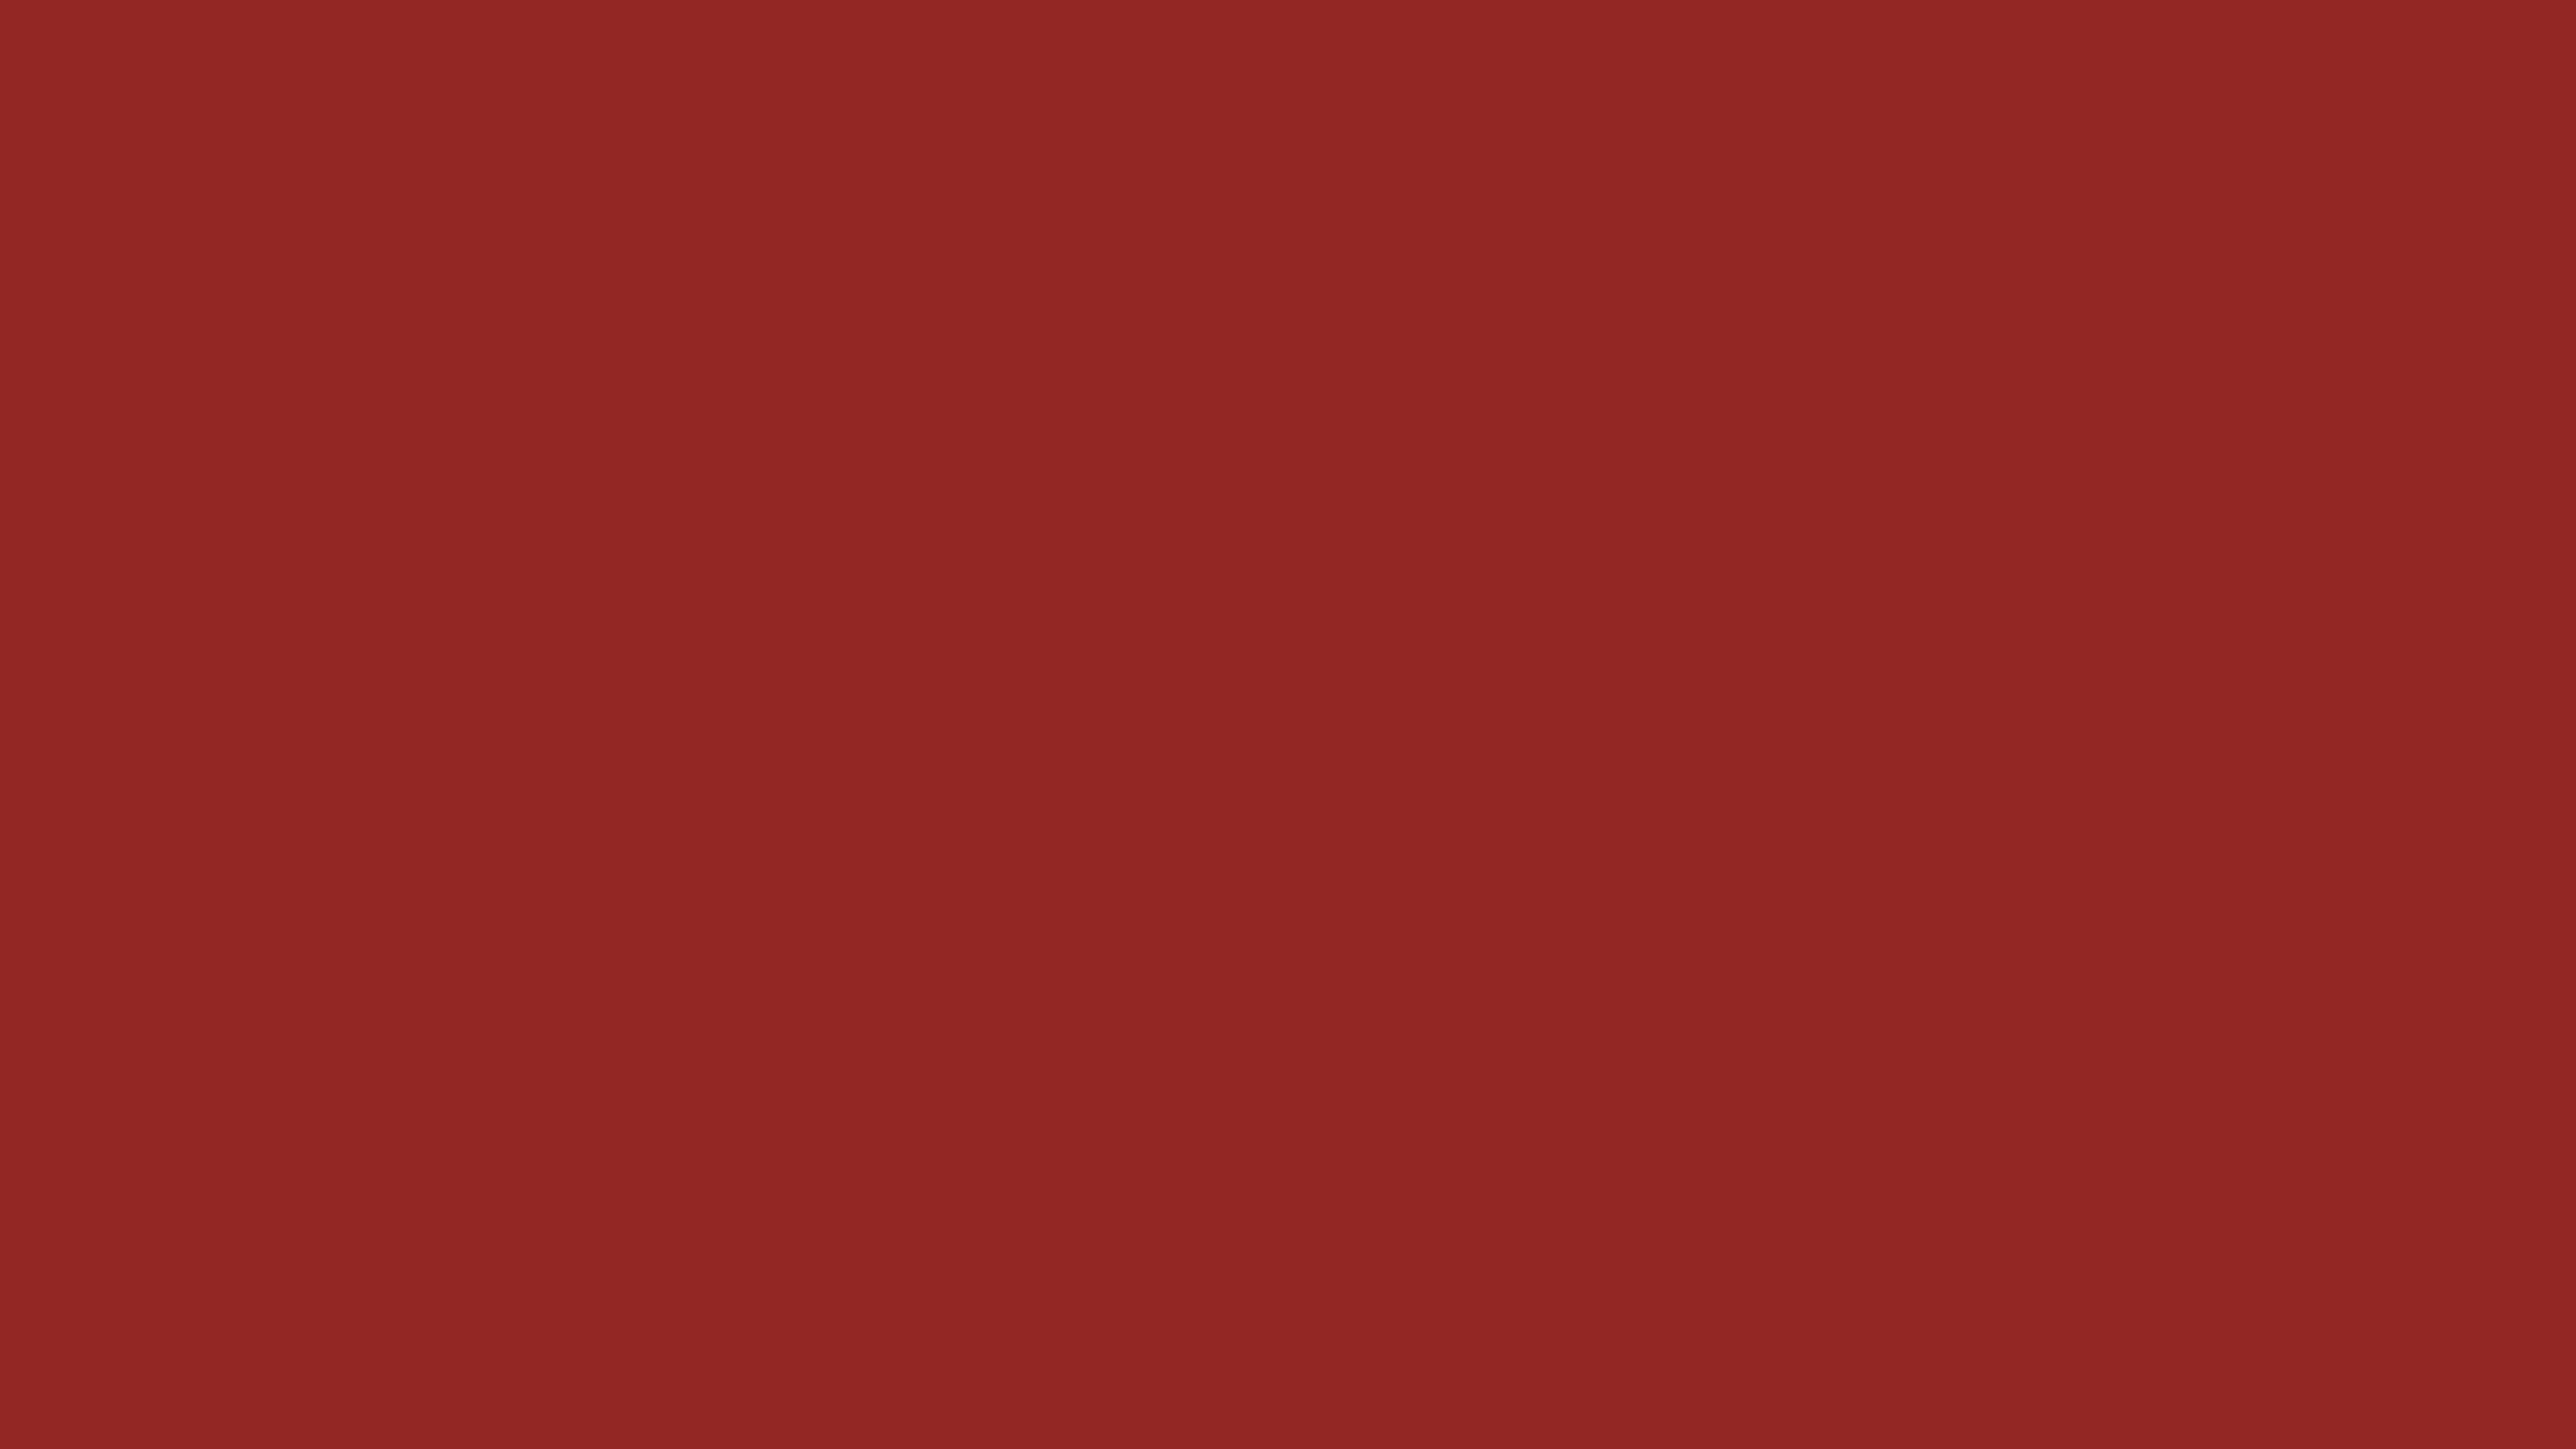 3840x2160 Vivid Auburn Solid Color Background